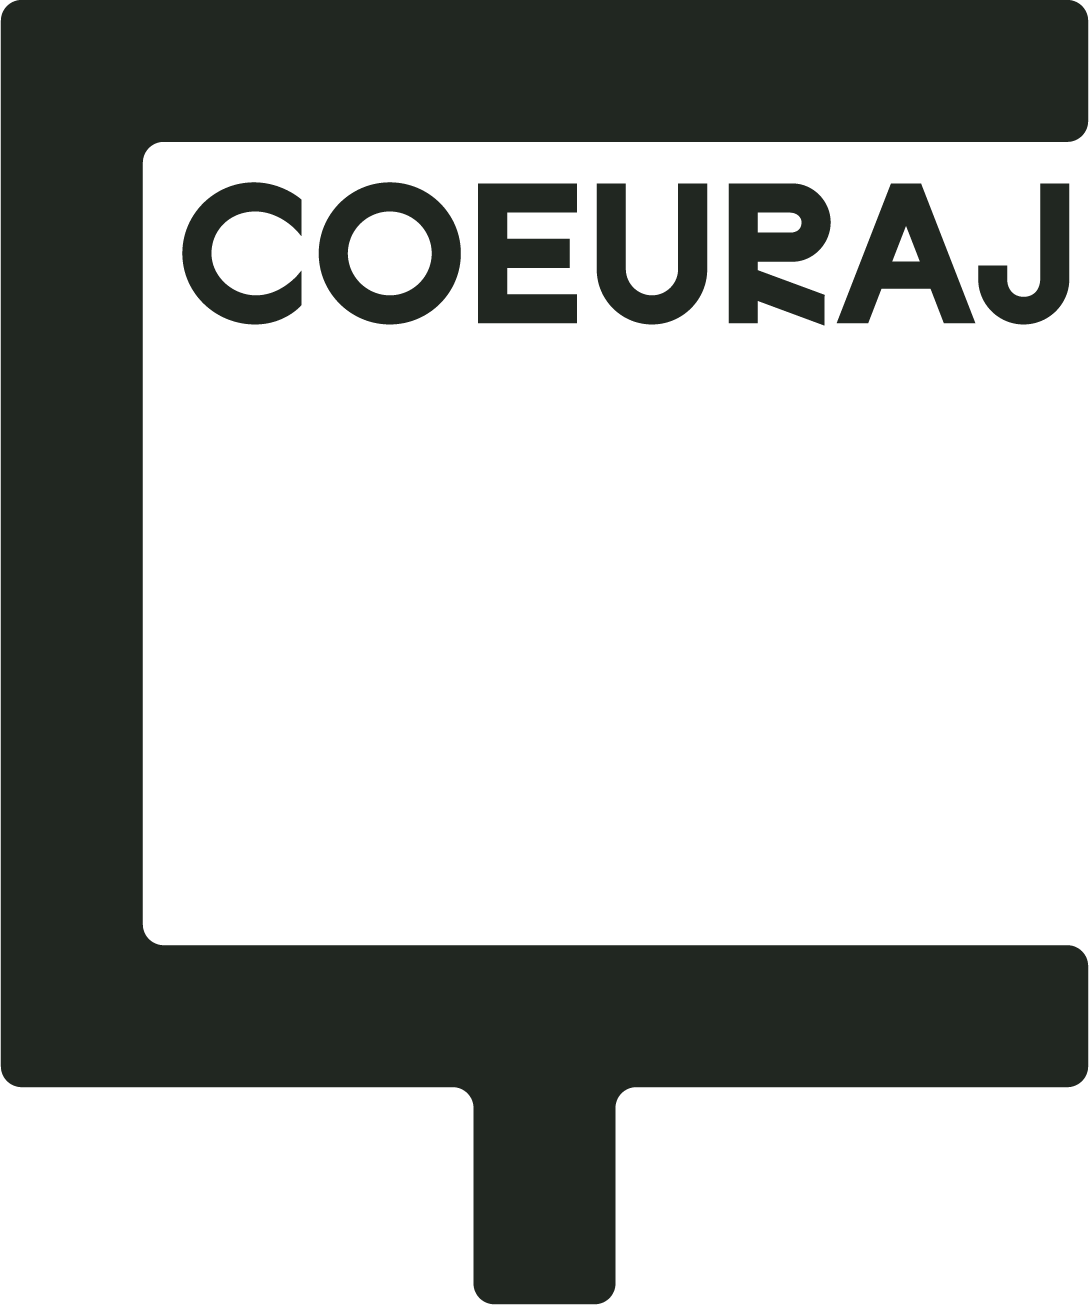 Coeuraj logo